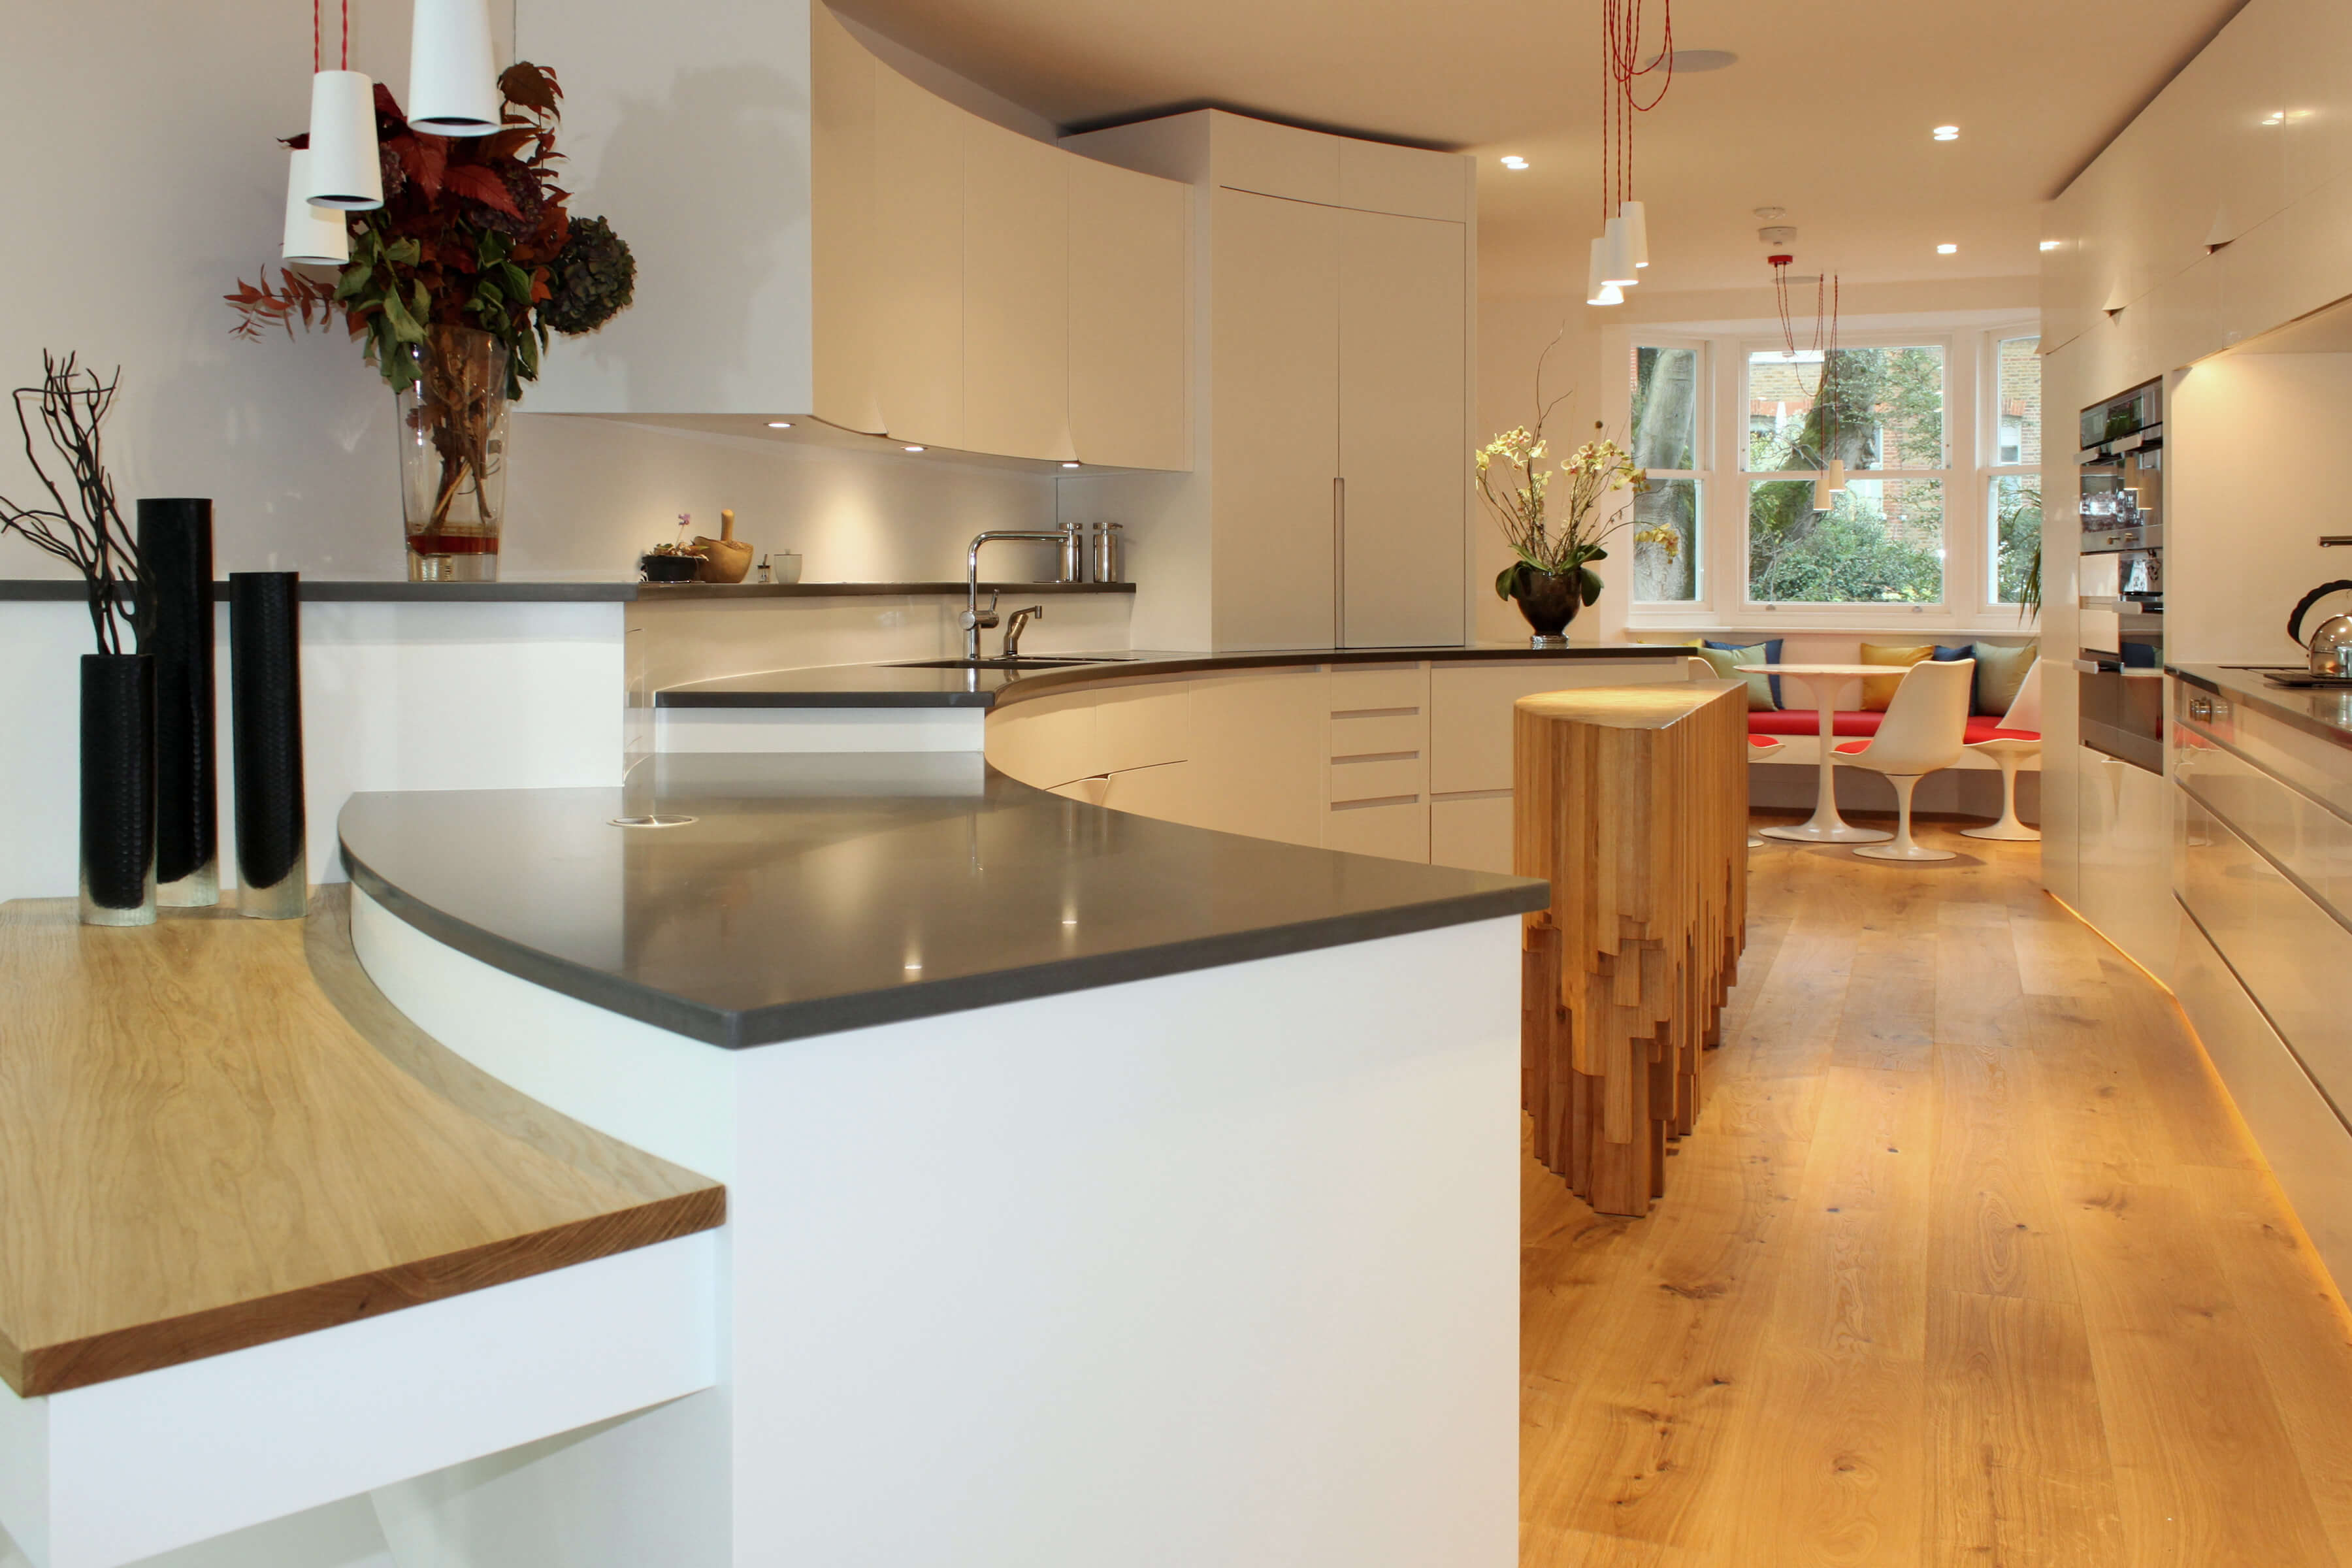 Original design for modern kitchen built over a split level with a sculptural kitchen island